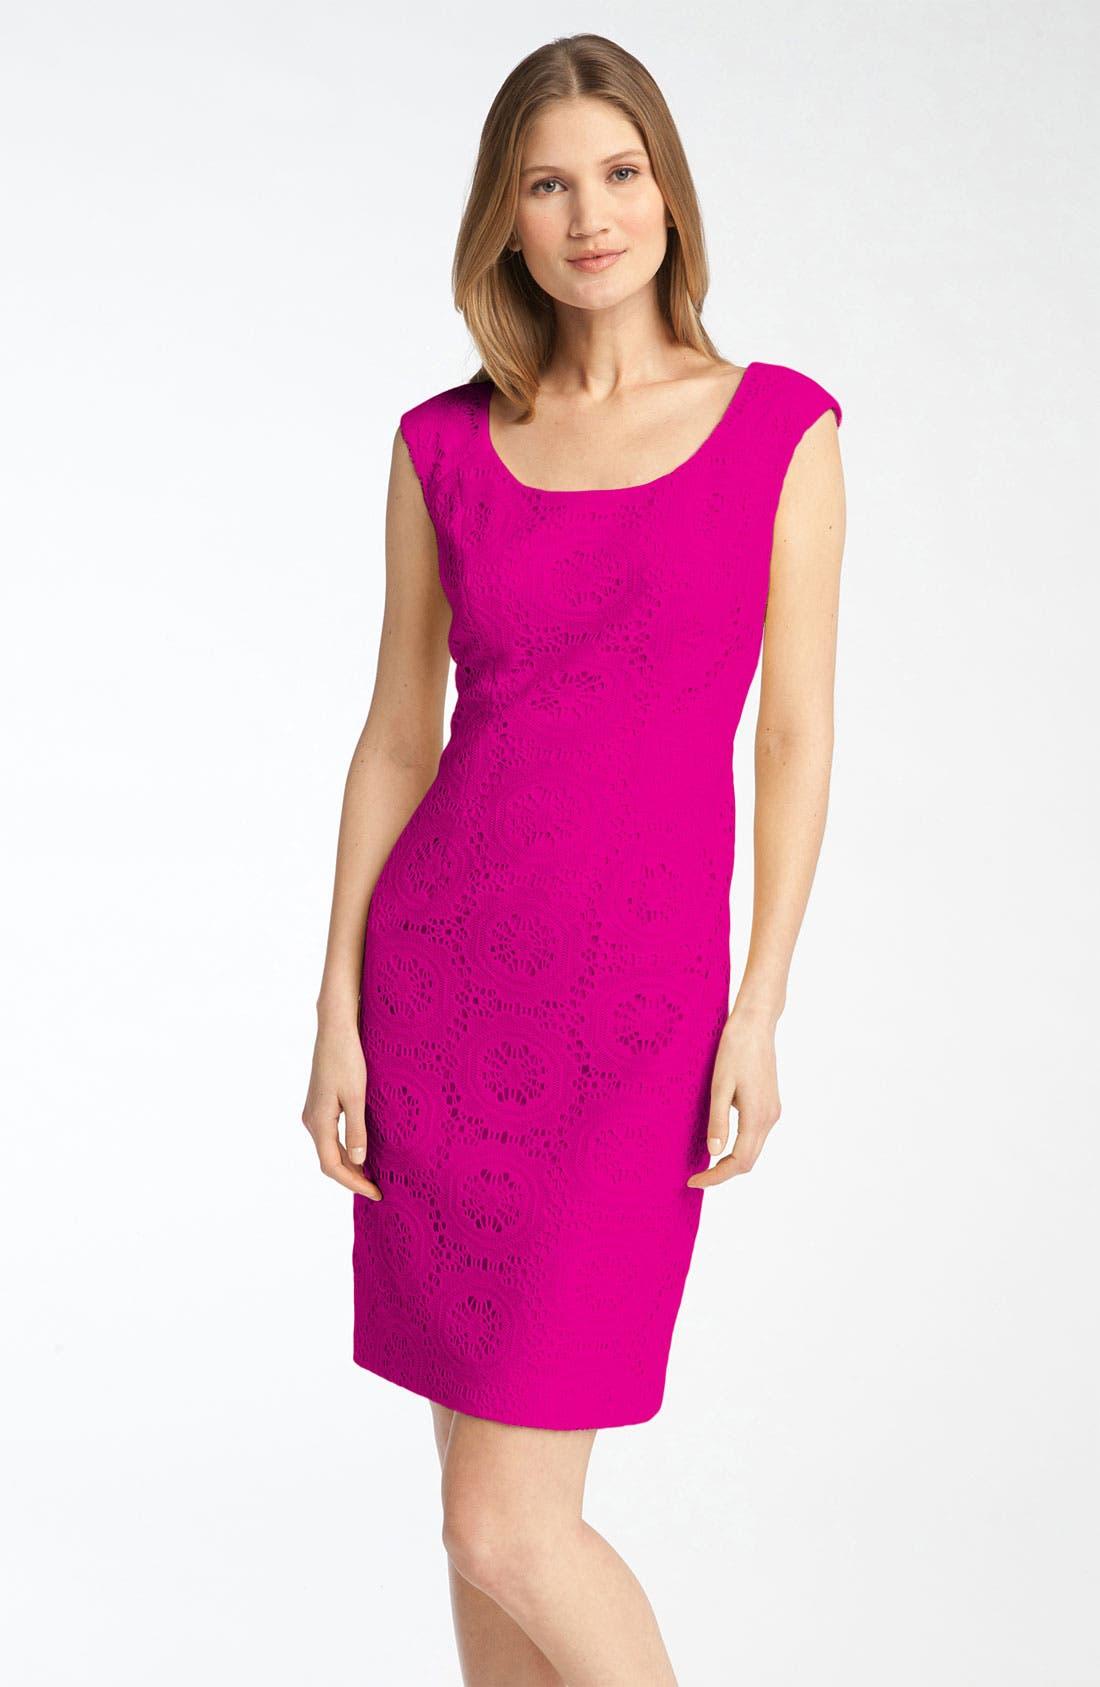 Alternate Image 1 Selected - Adrianna Papell Crochet Sheath Dress